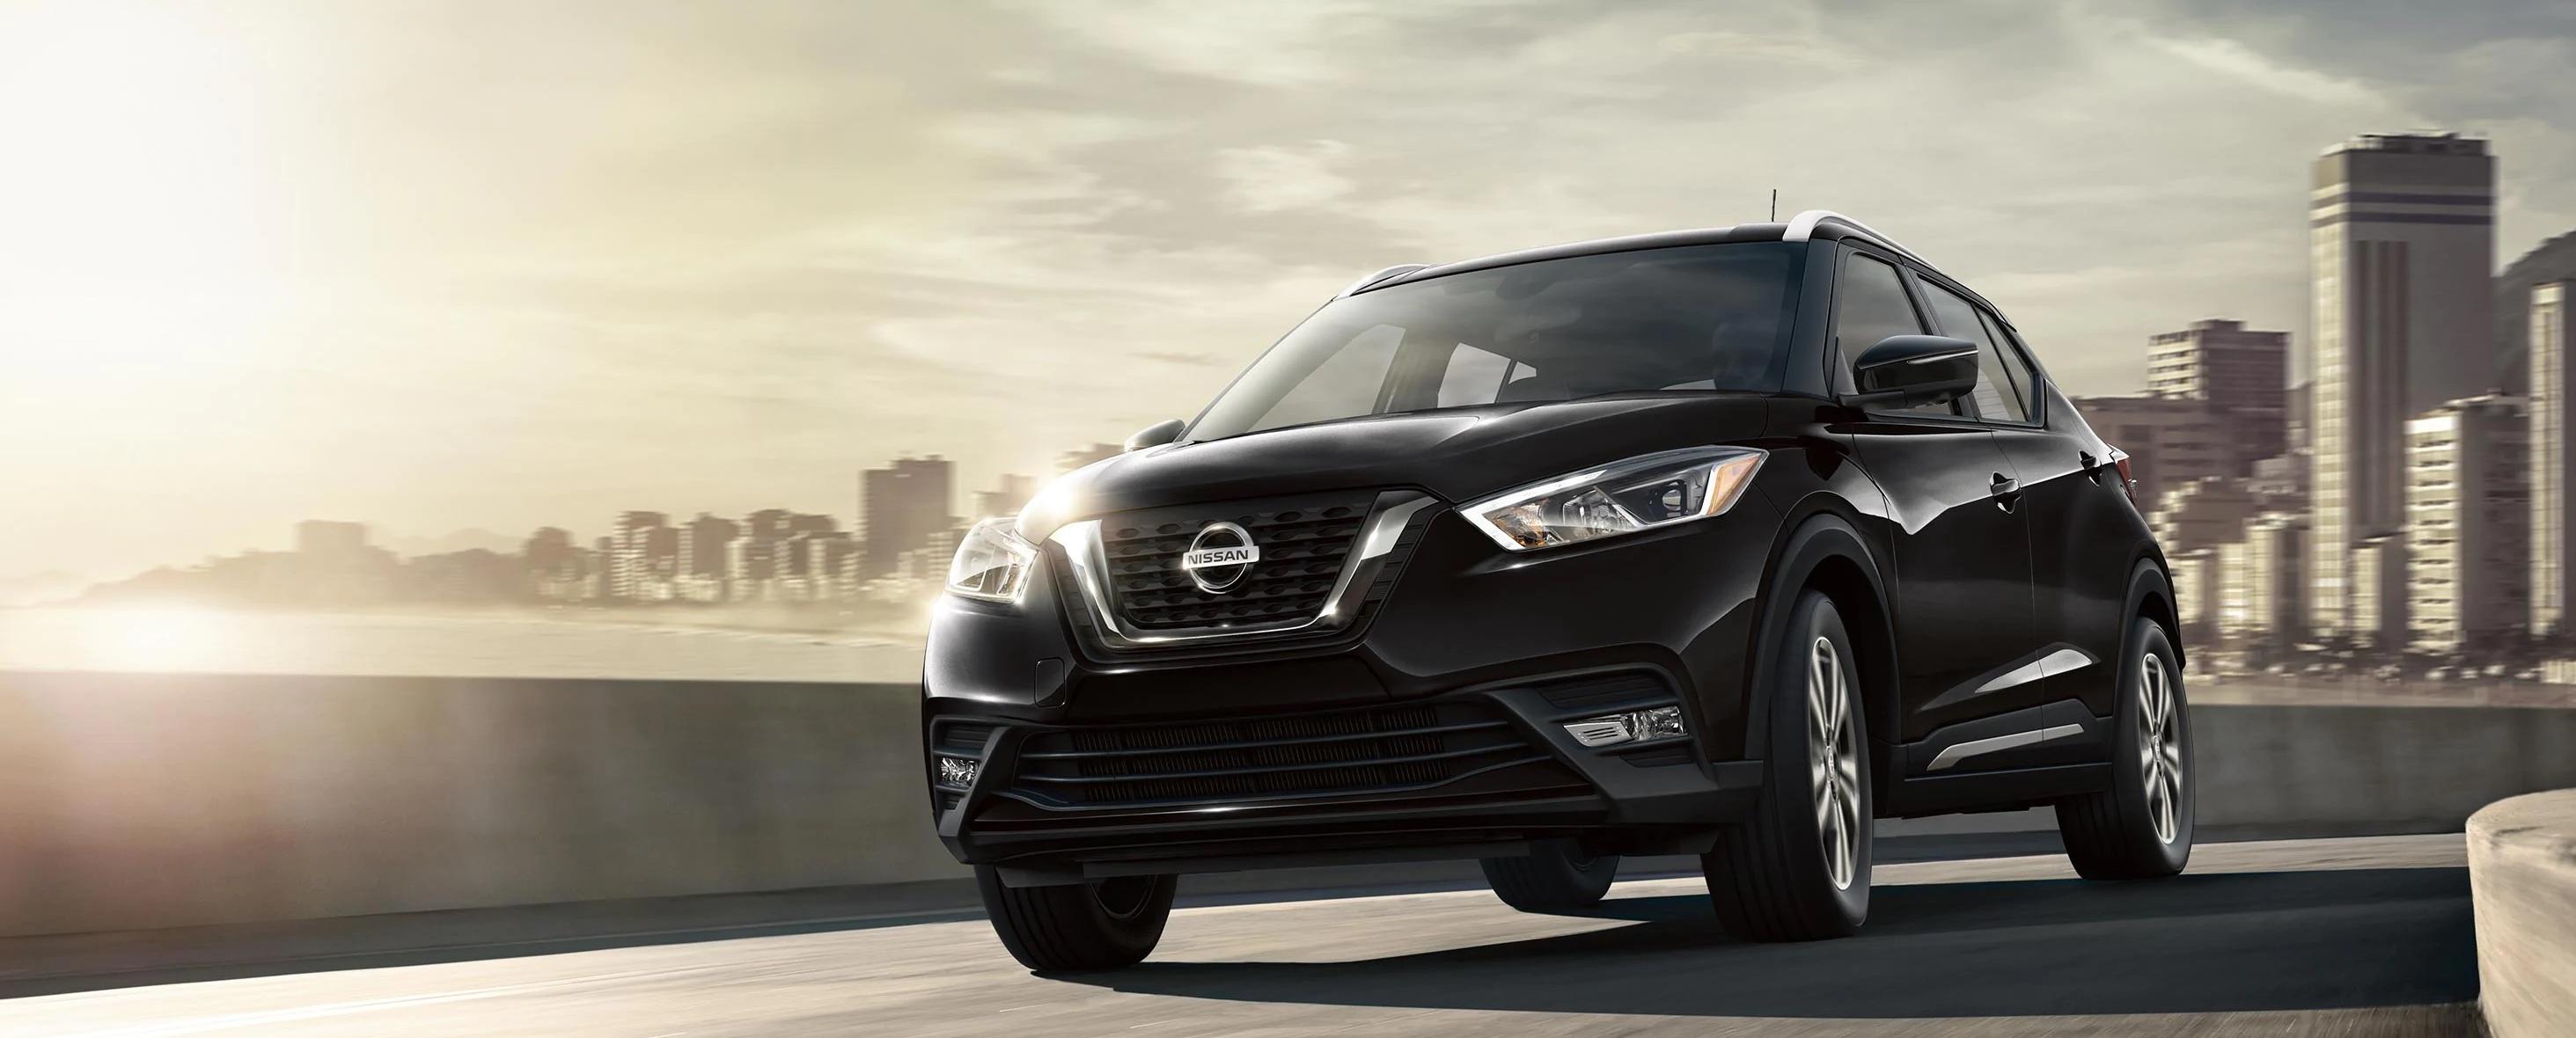 2020 Nissan Kicks Leasing near Tinley Park, IL